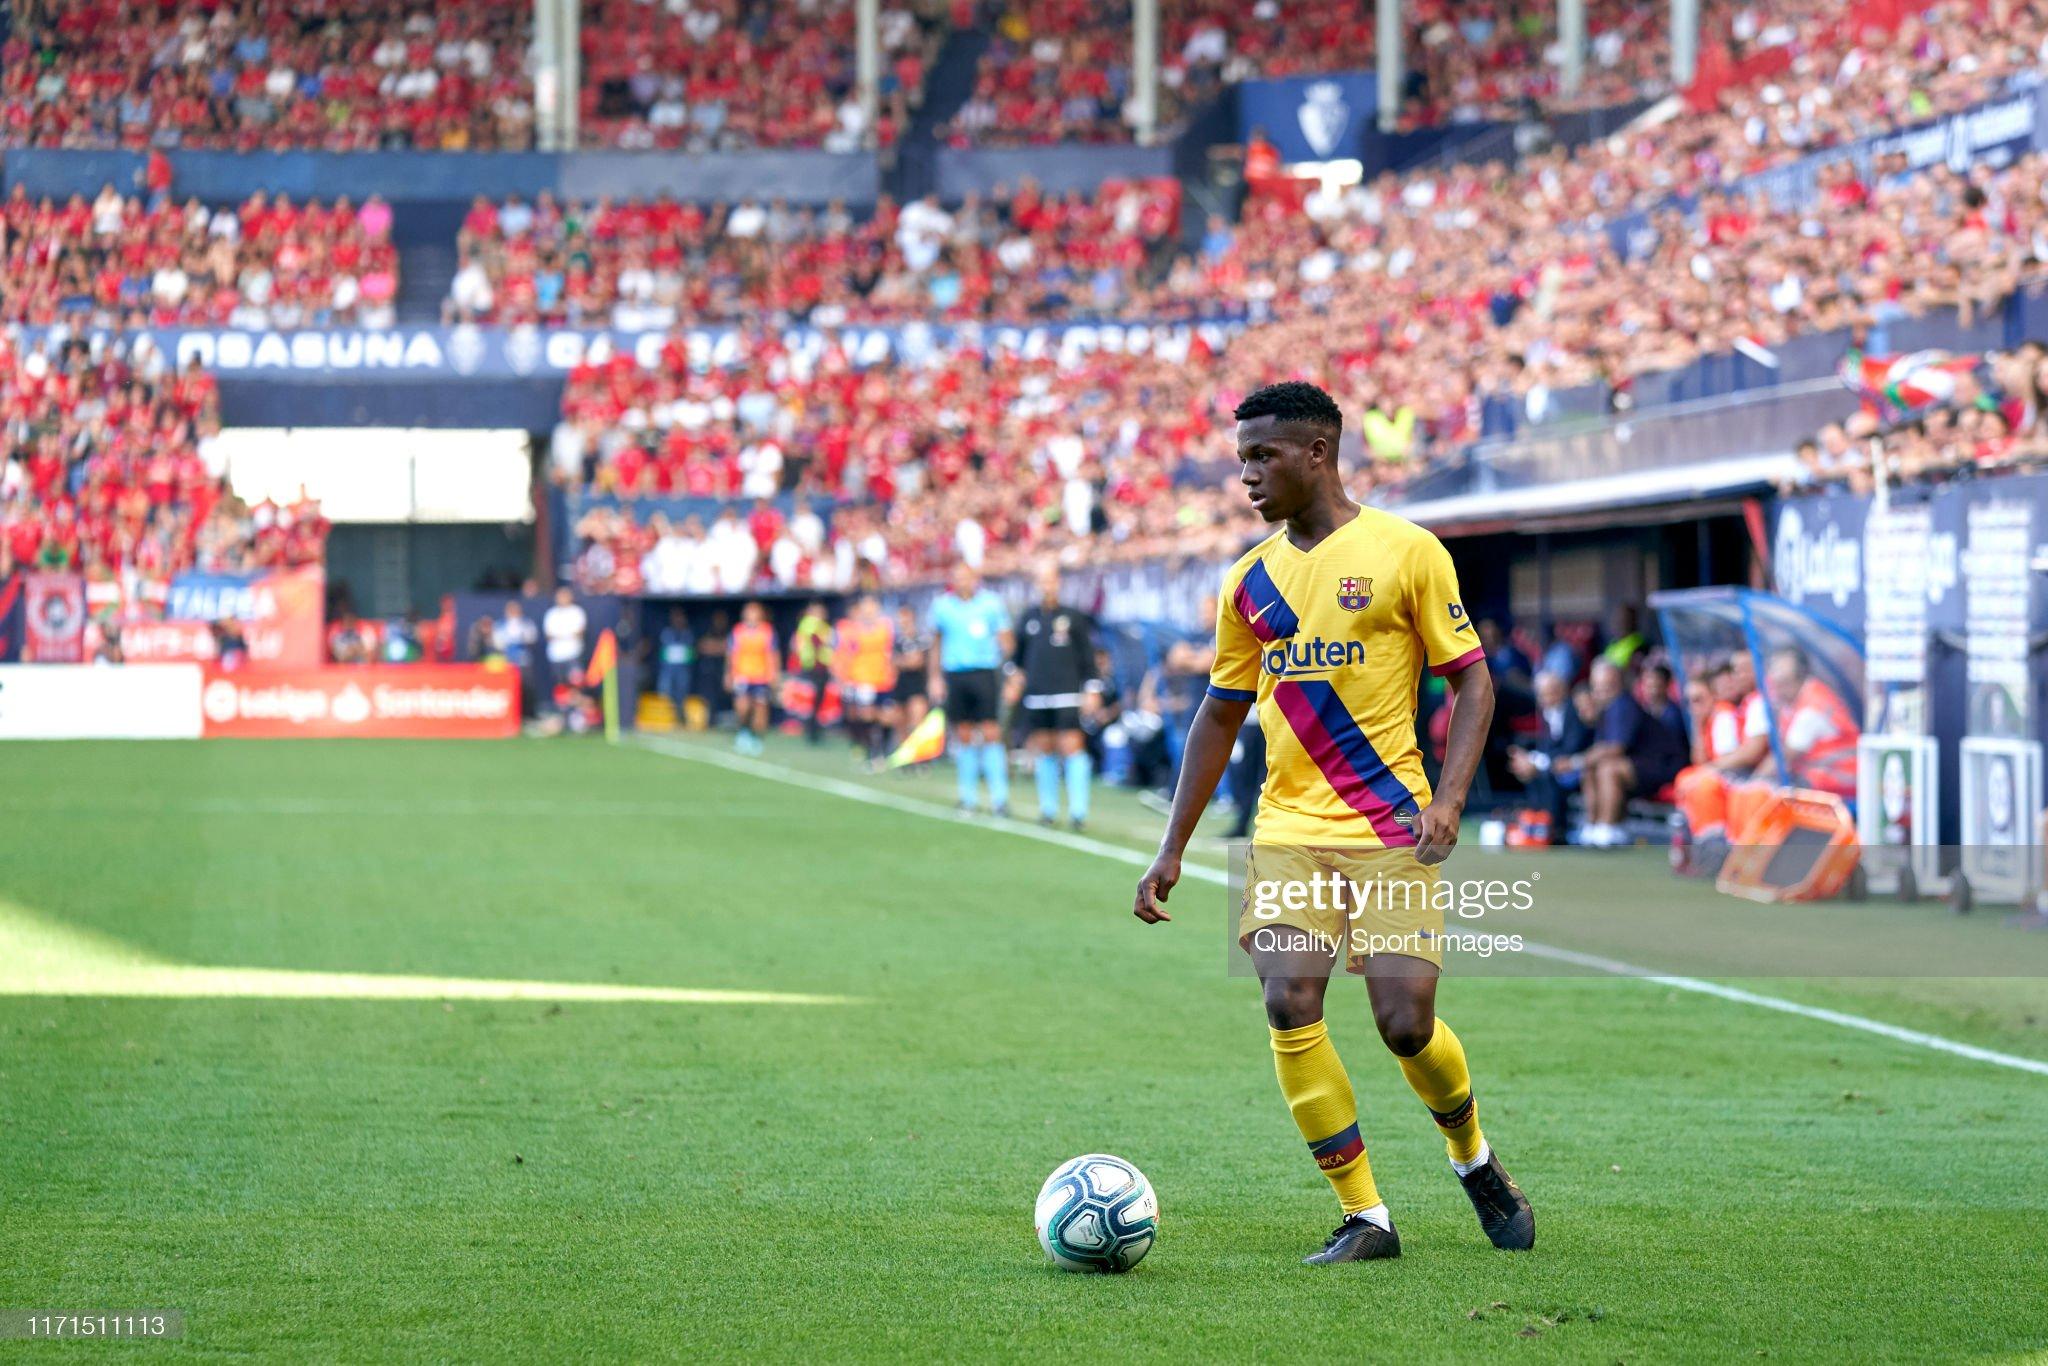 صور مباراة : أوساسونا - برشلونة 2-2 ( 31-08-2019 )  Ansu-fati-of-fc-barcelona-with-the-ball-during-the-liga-match-between-picture-id1171511113?s=2048x2048